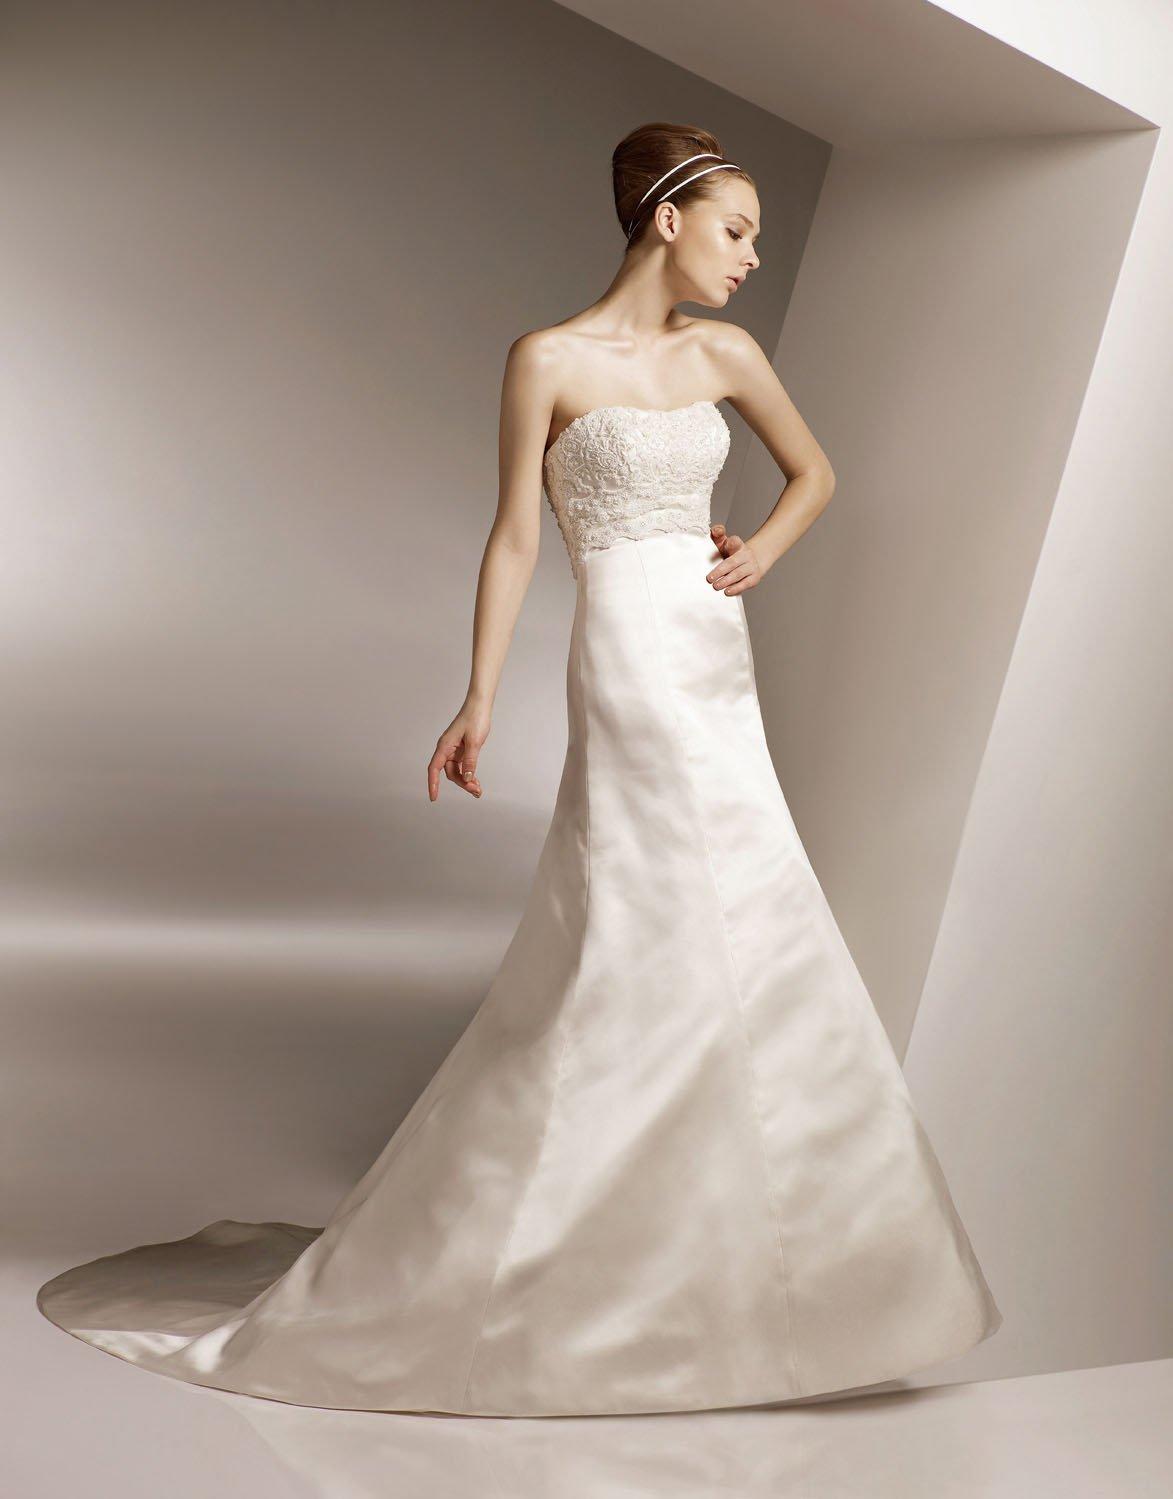 Scoop Neckline Strapless Appliqued Beading Taffeta Wedding Dress Bridal Gown